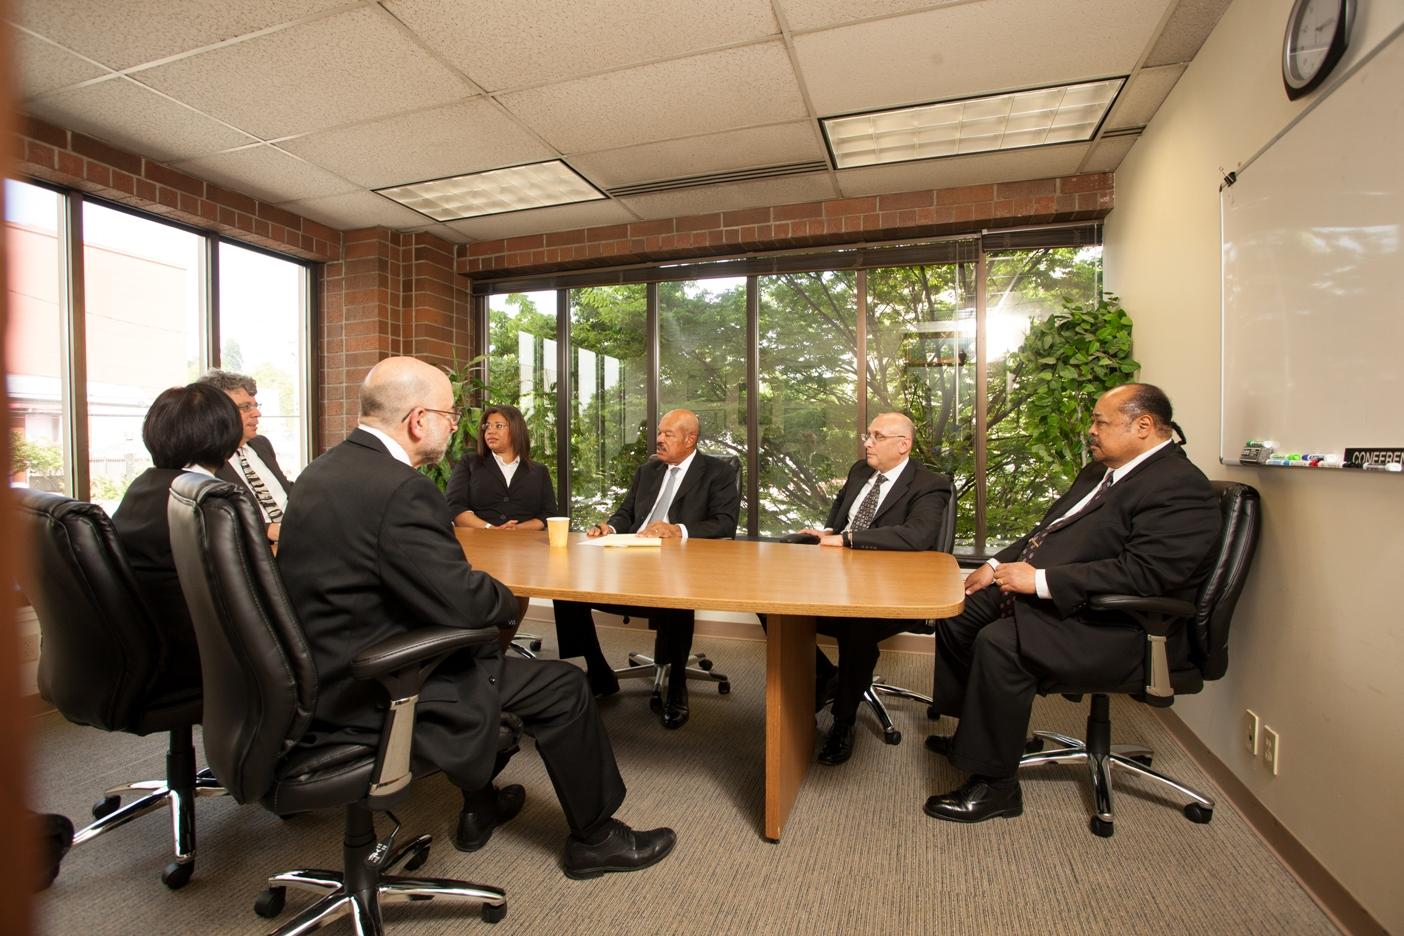 Buckley & Associates image 2